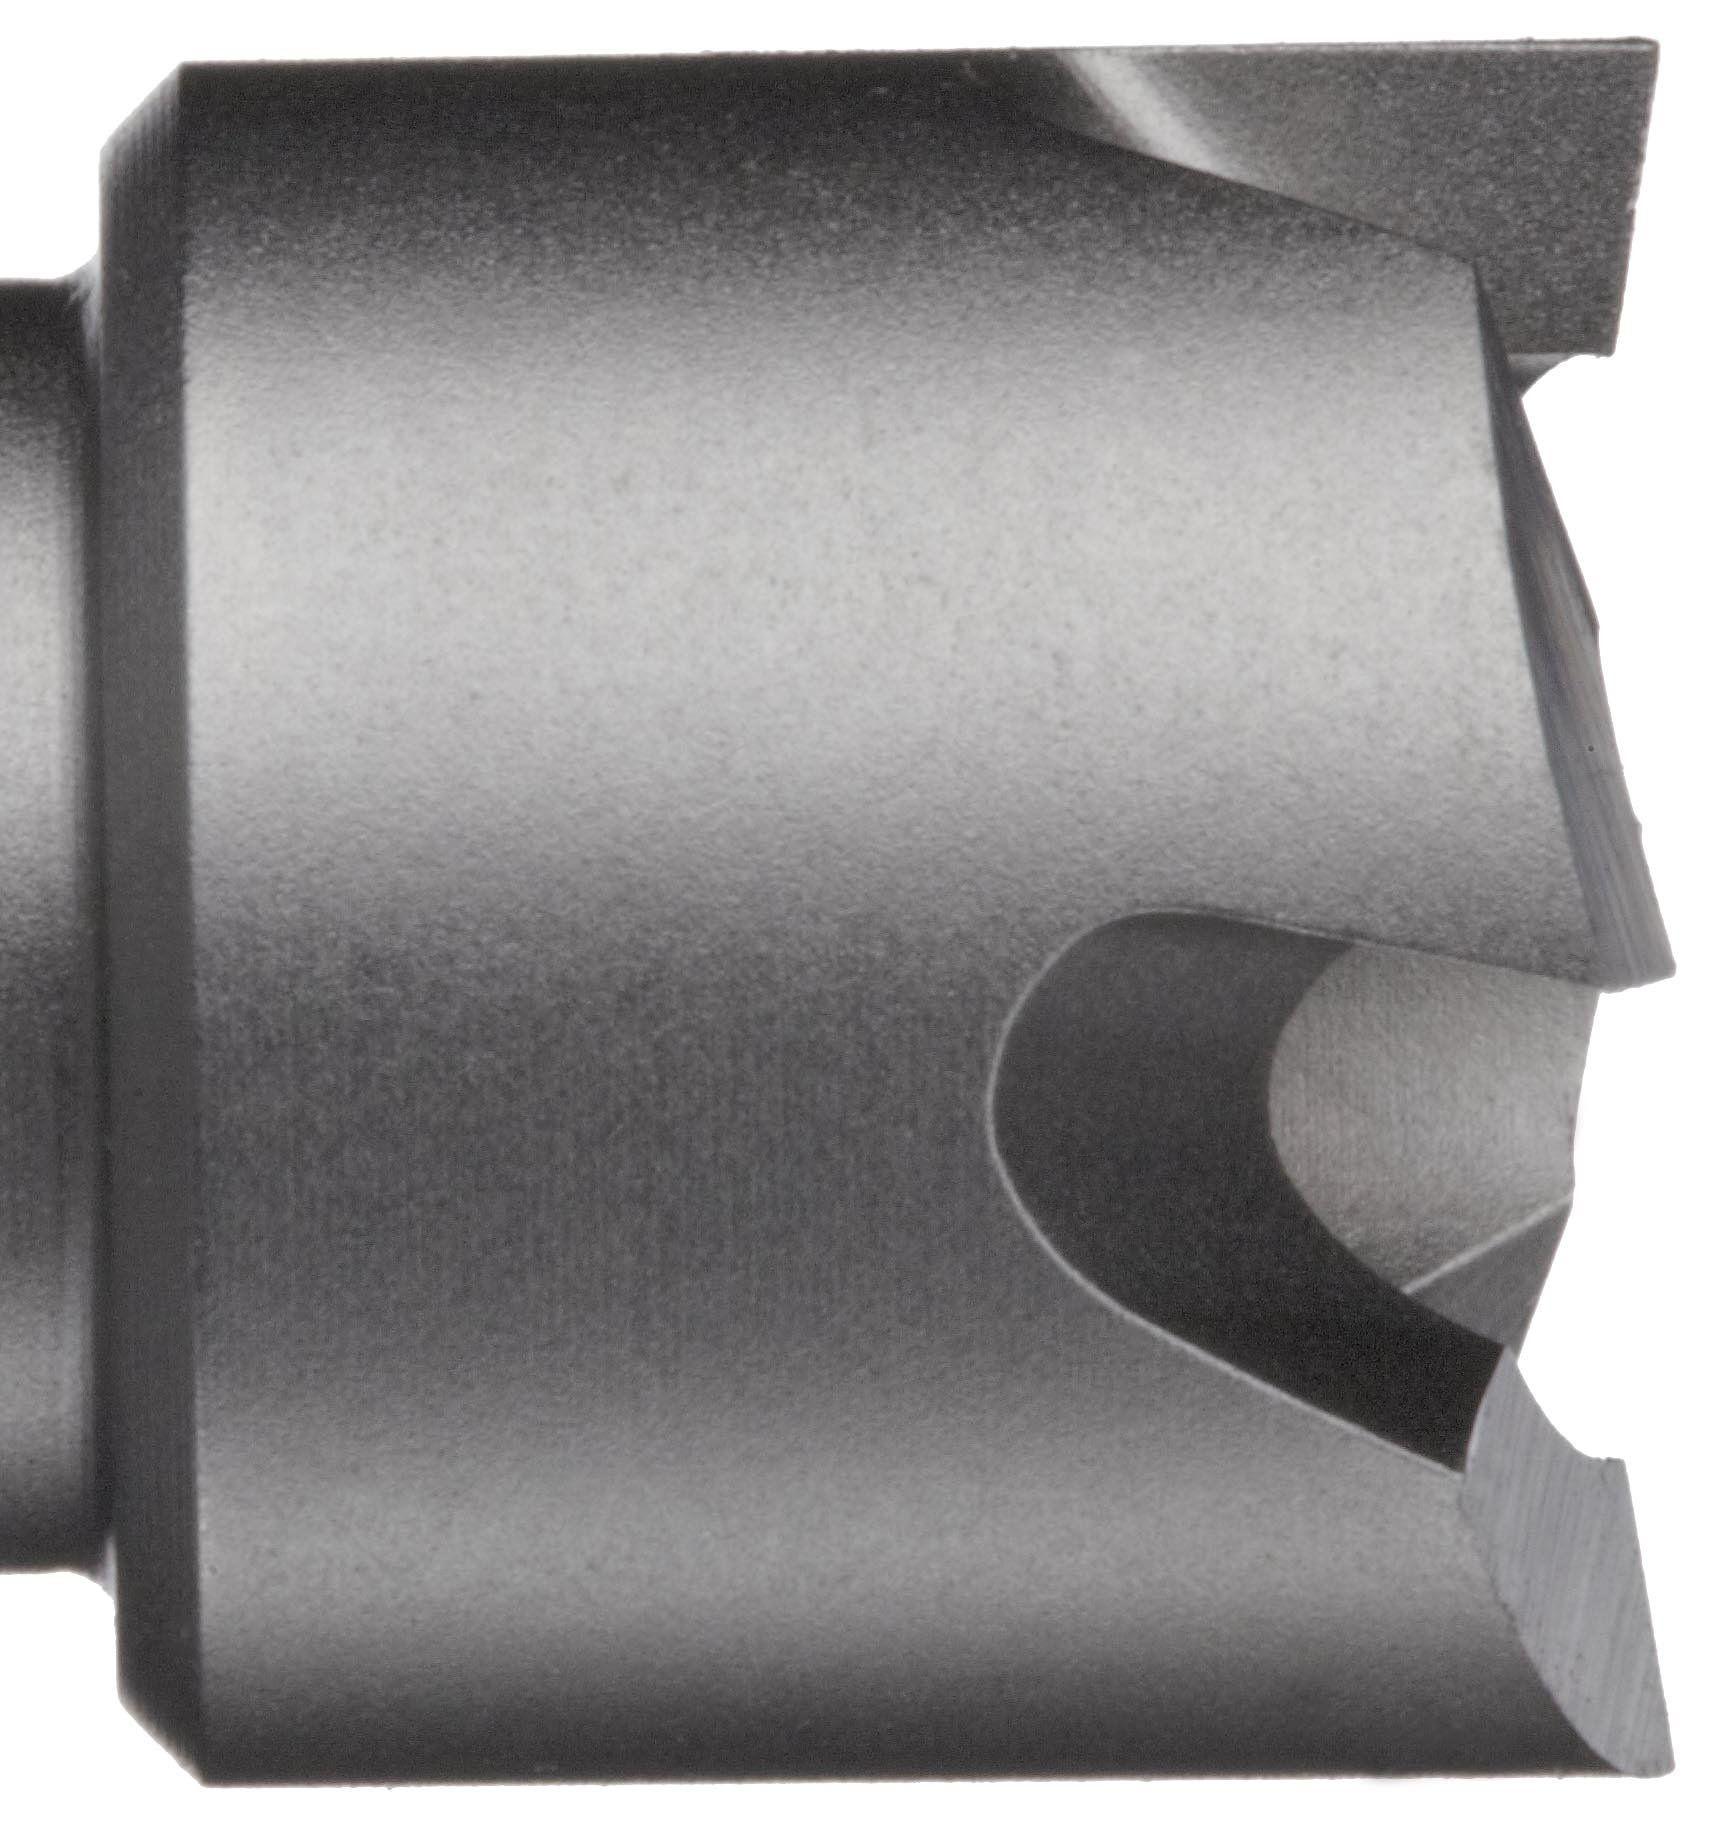 Jancy Slugger High Speed Steel Sheet Metal Cutter Uncoated Bright Finish 3 8 Annular Shank 1 4 Depth Steel Sheet Metal Metal Cutter Sheet Metal Cutter